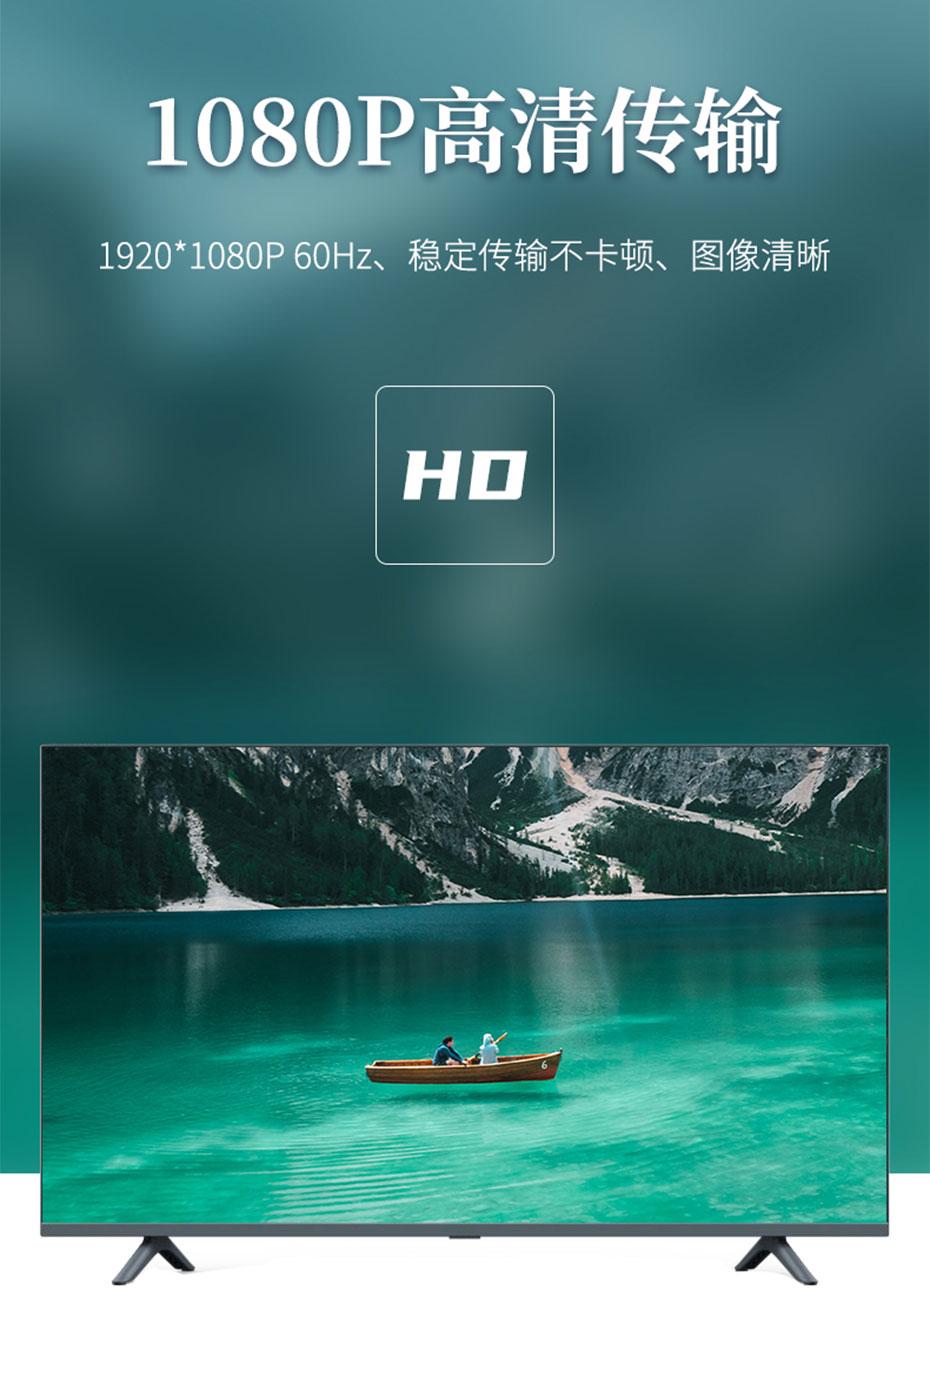 HDMI网络延长器1对多HE150实现单网线延长150米